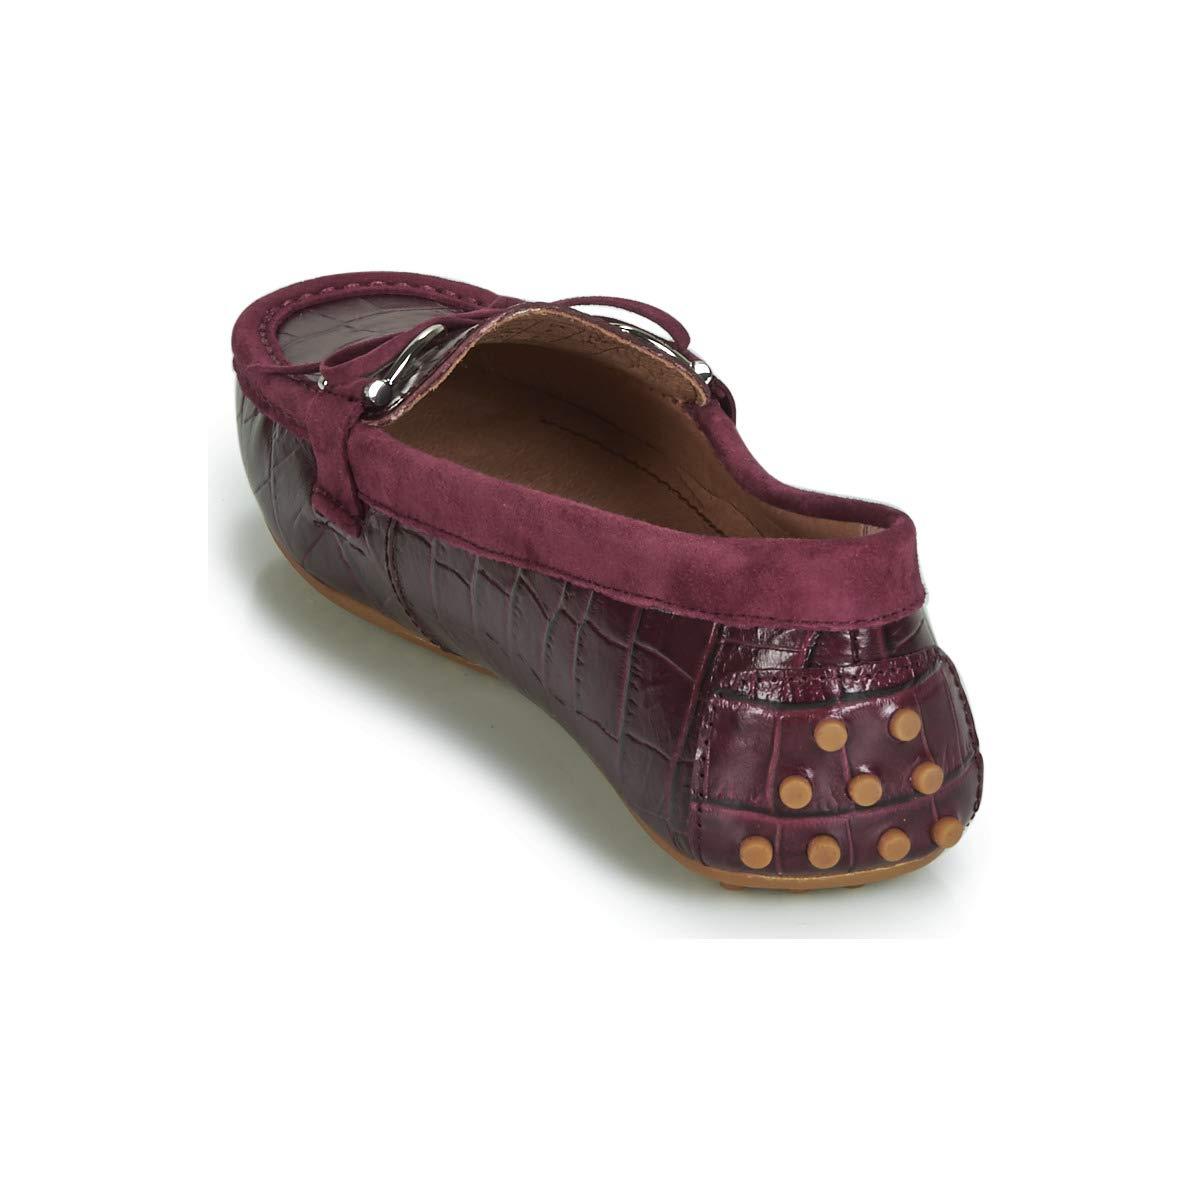 Chaussures Ralph pour Femmes Lauren 802 710082 002